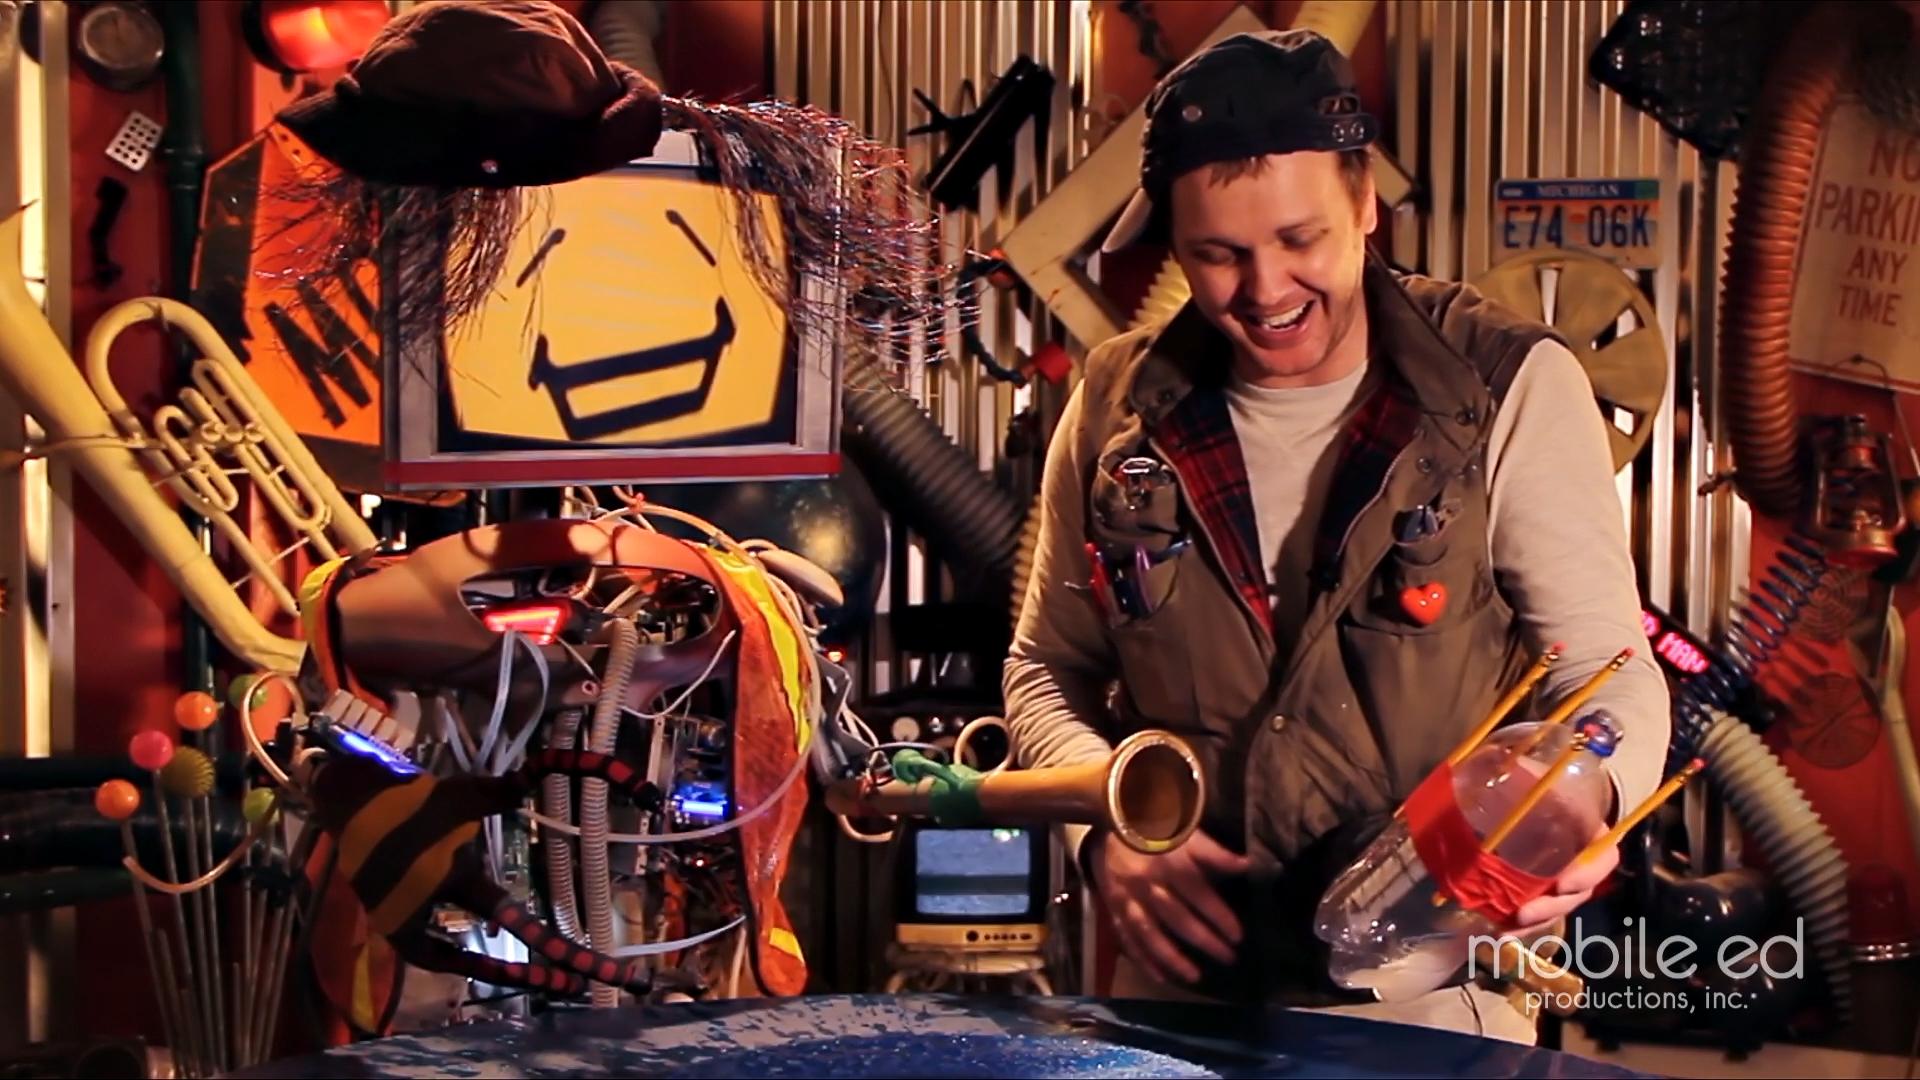 It's so much fun to build your own rocket!  Handy Dan the Junkyard Man